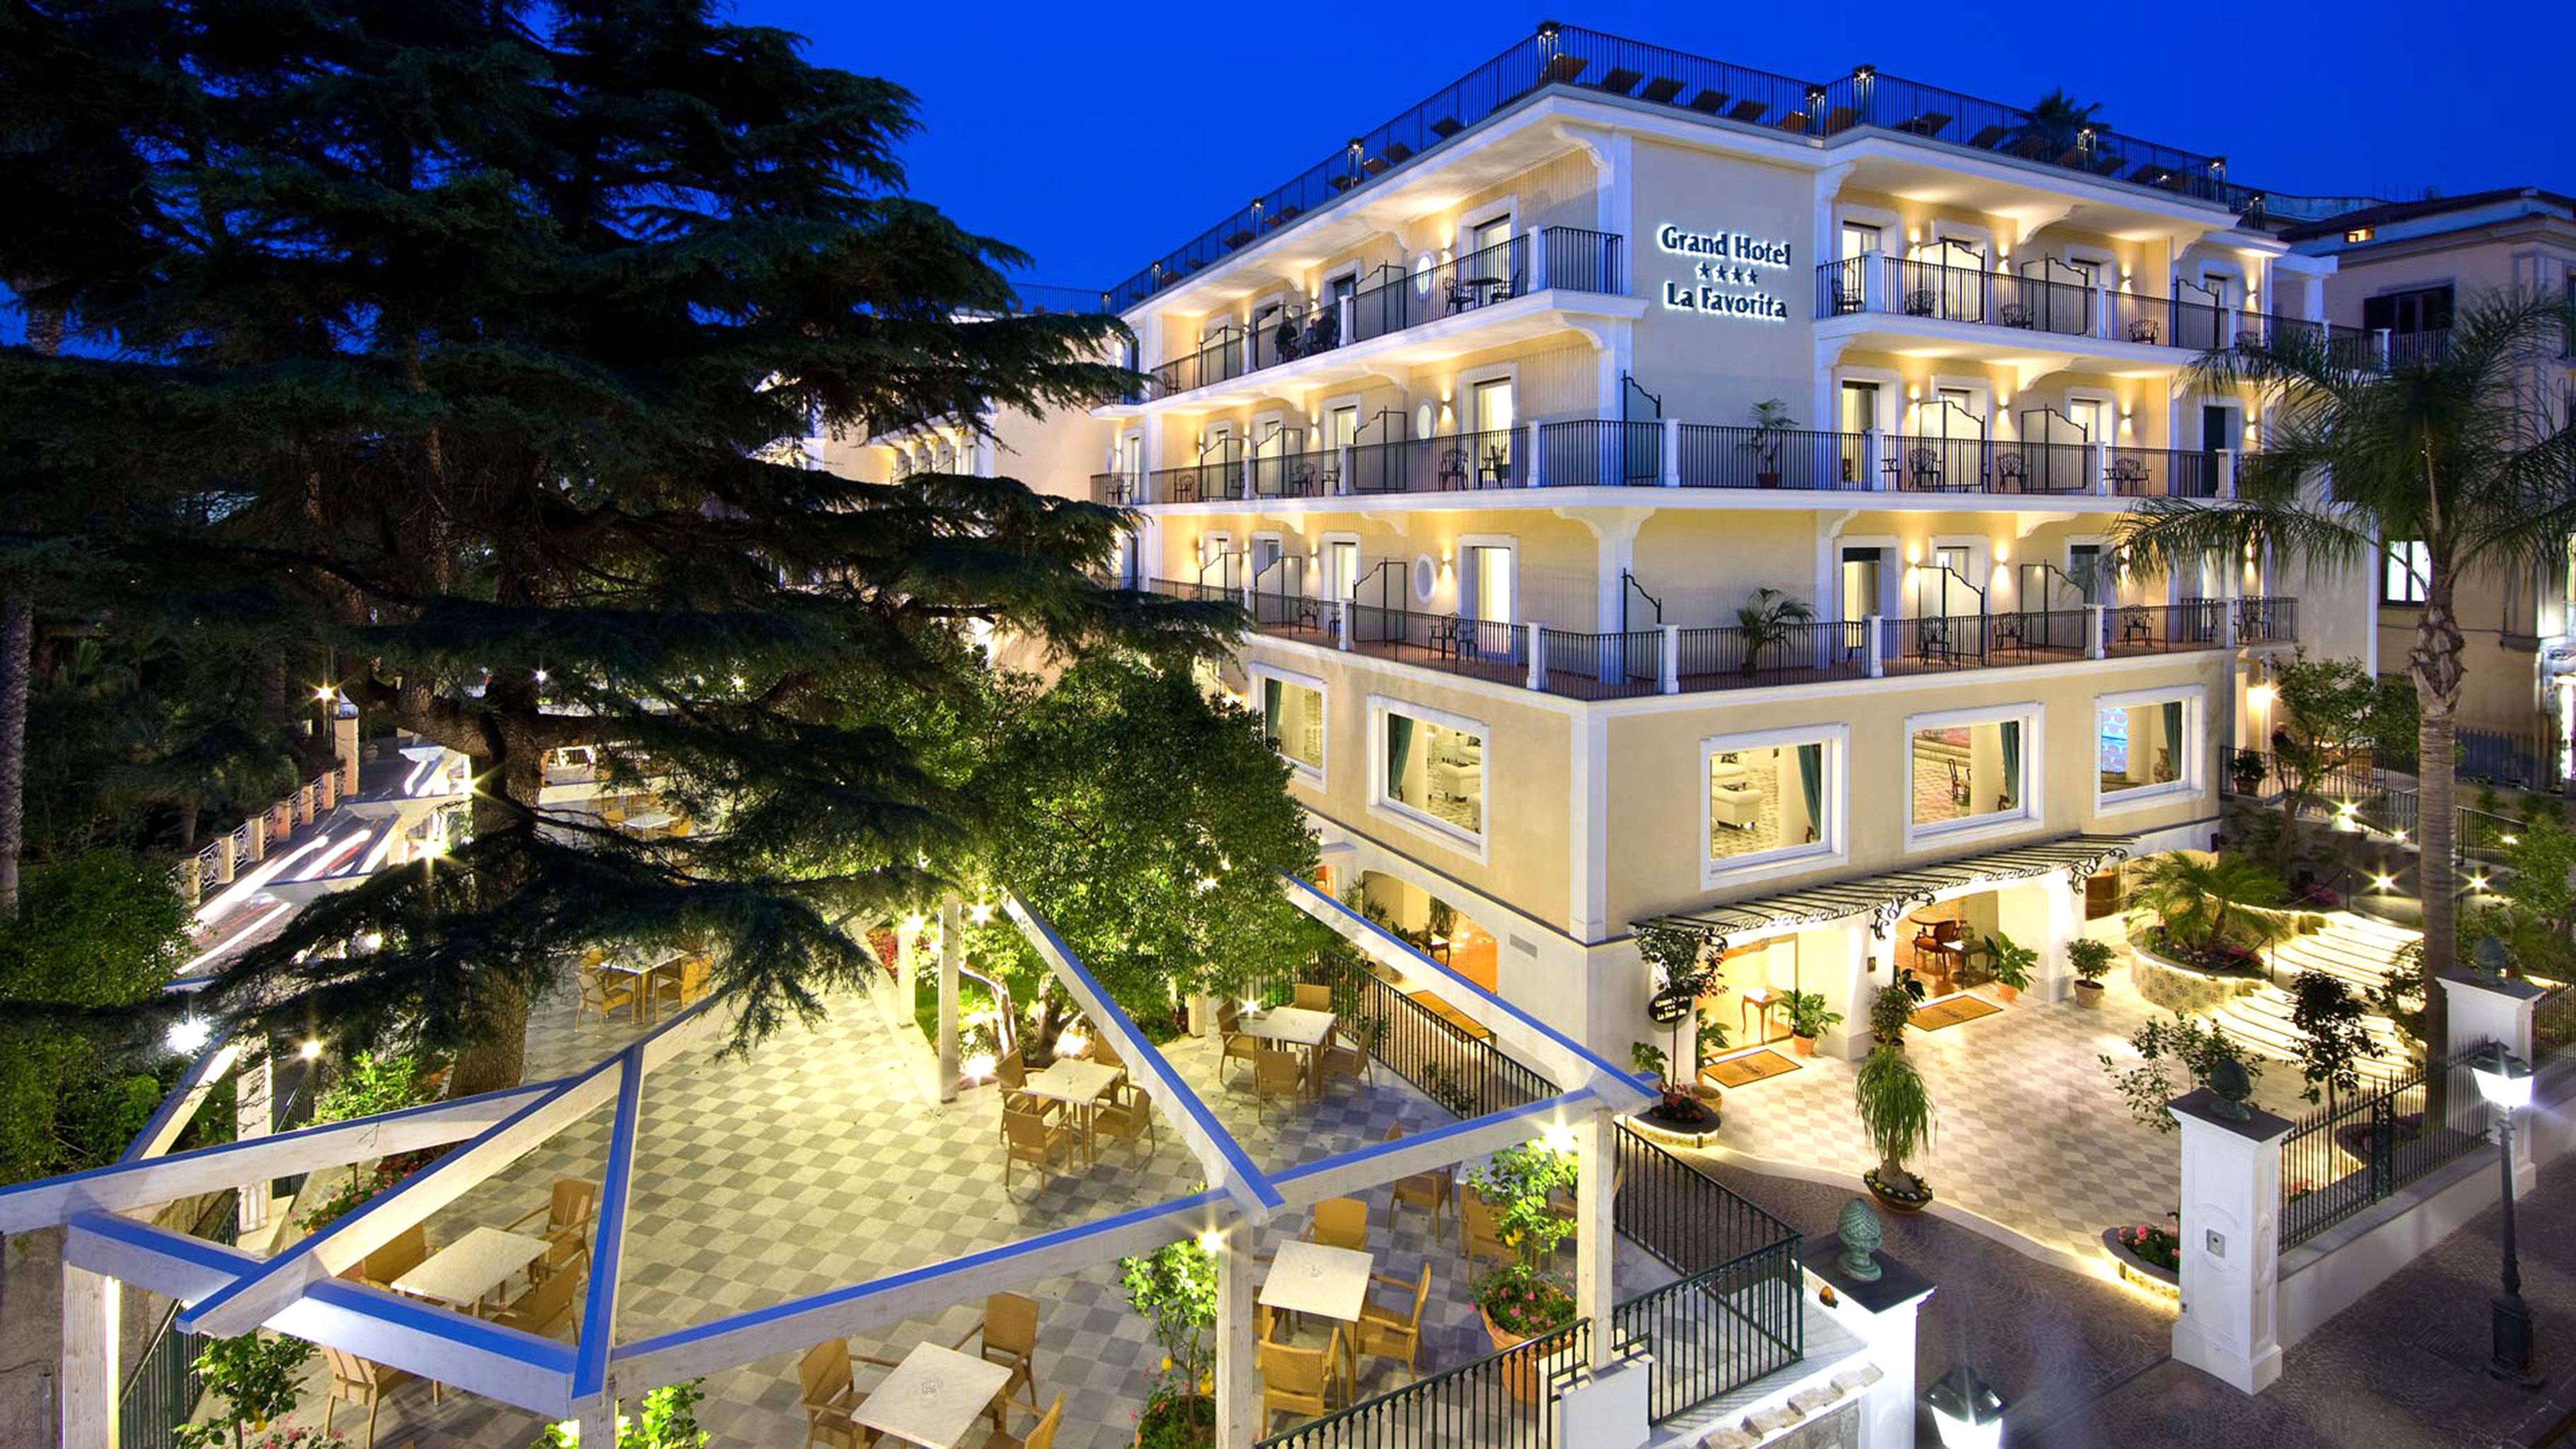 Classic Grounds Scenic views Sea landmark Town neighbourhood condominium plaza residential area Resort